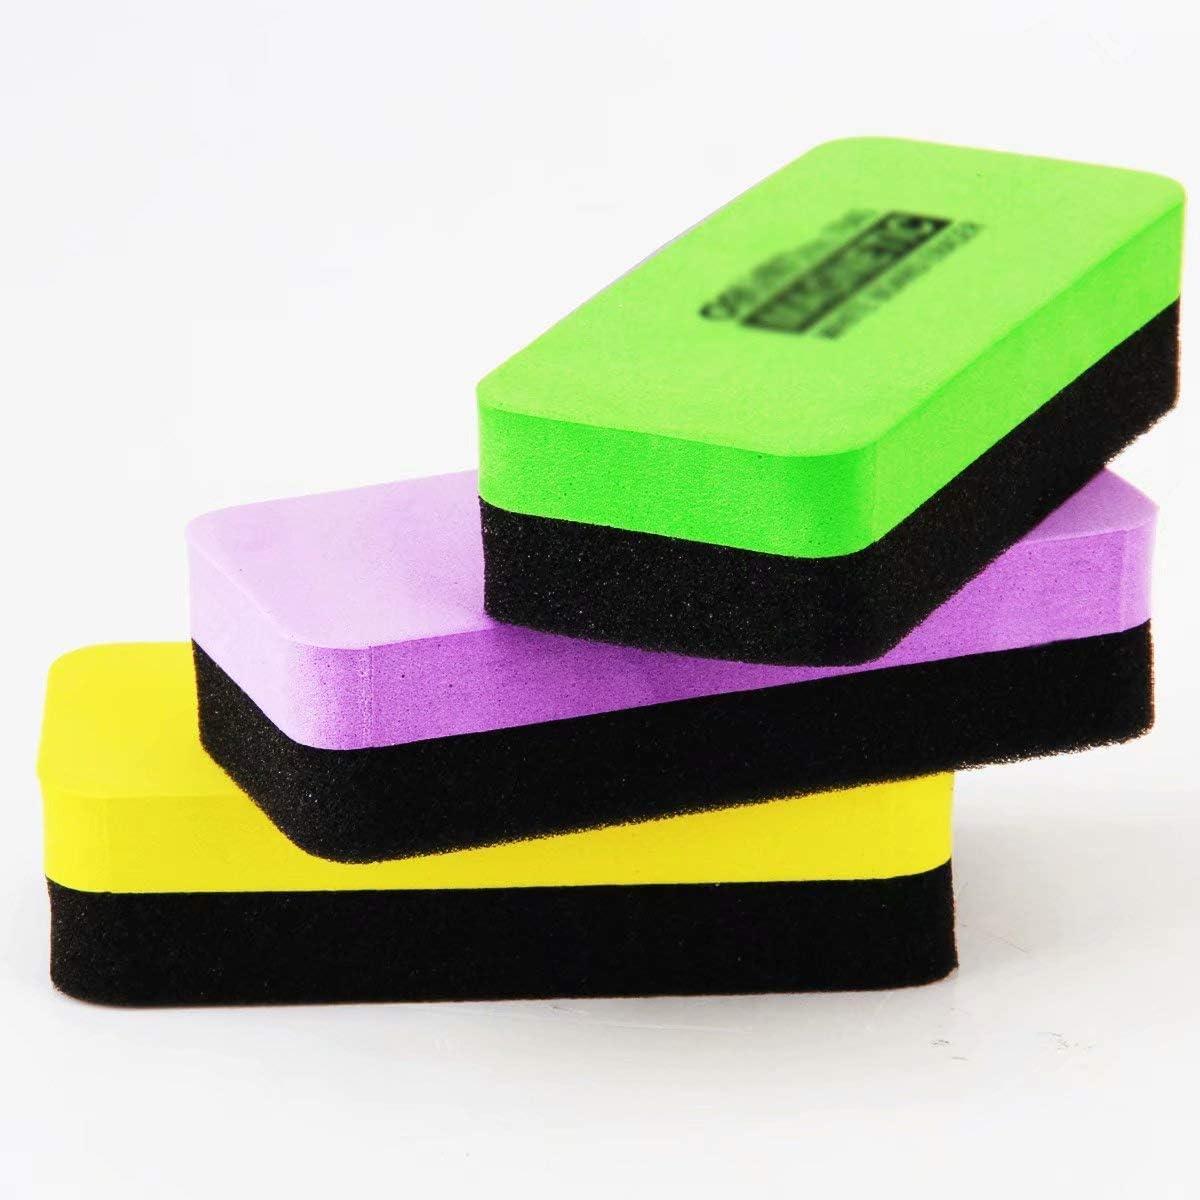 4Pcs Magnetic White Black Board Dry Wipe Cleaner Eraser Chalkboard Chalk Eraser for Office Classroom